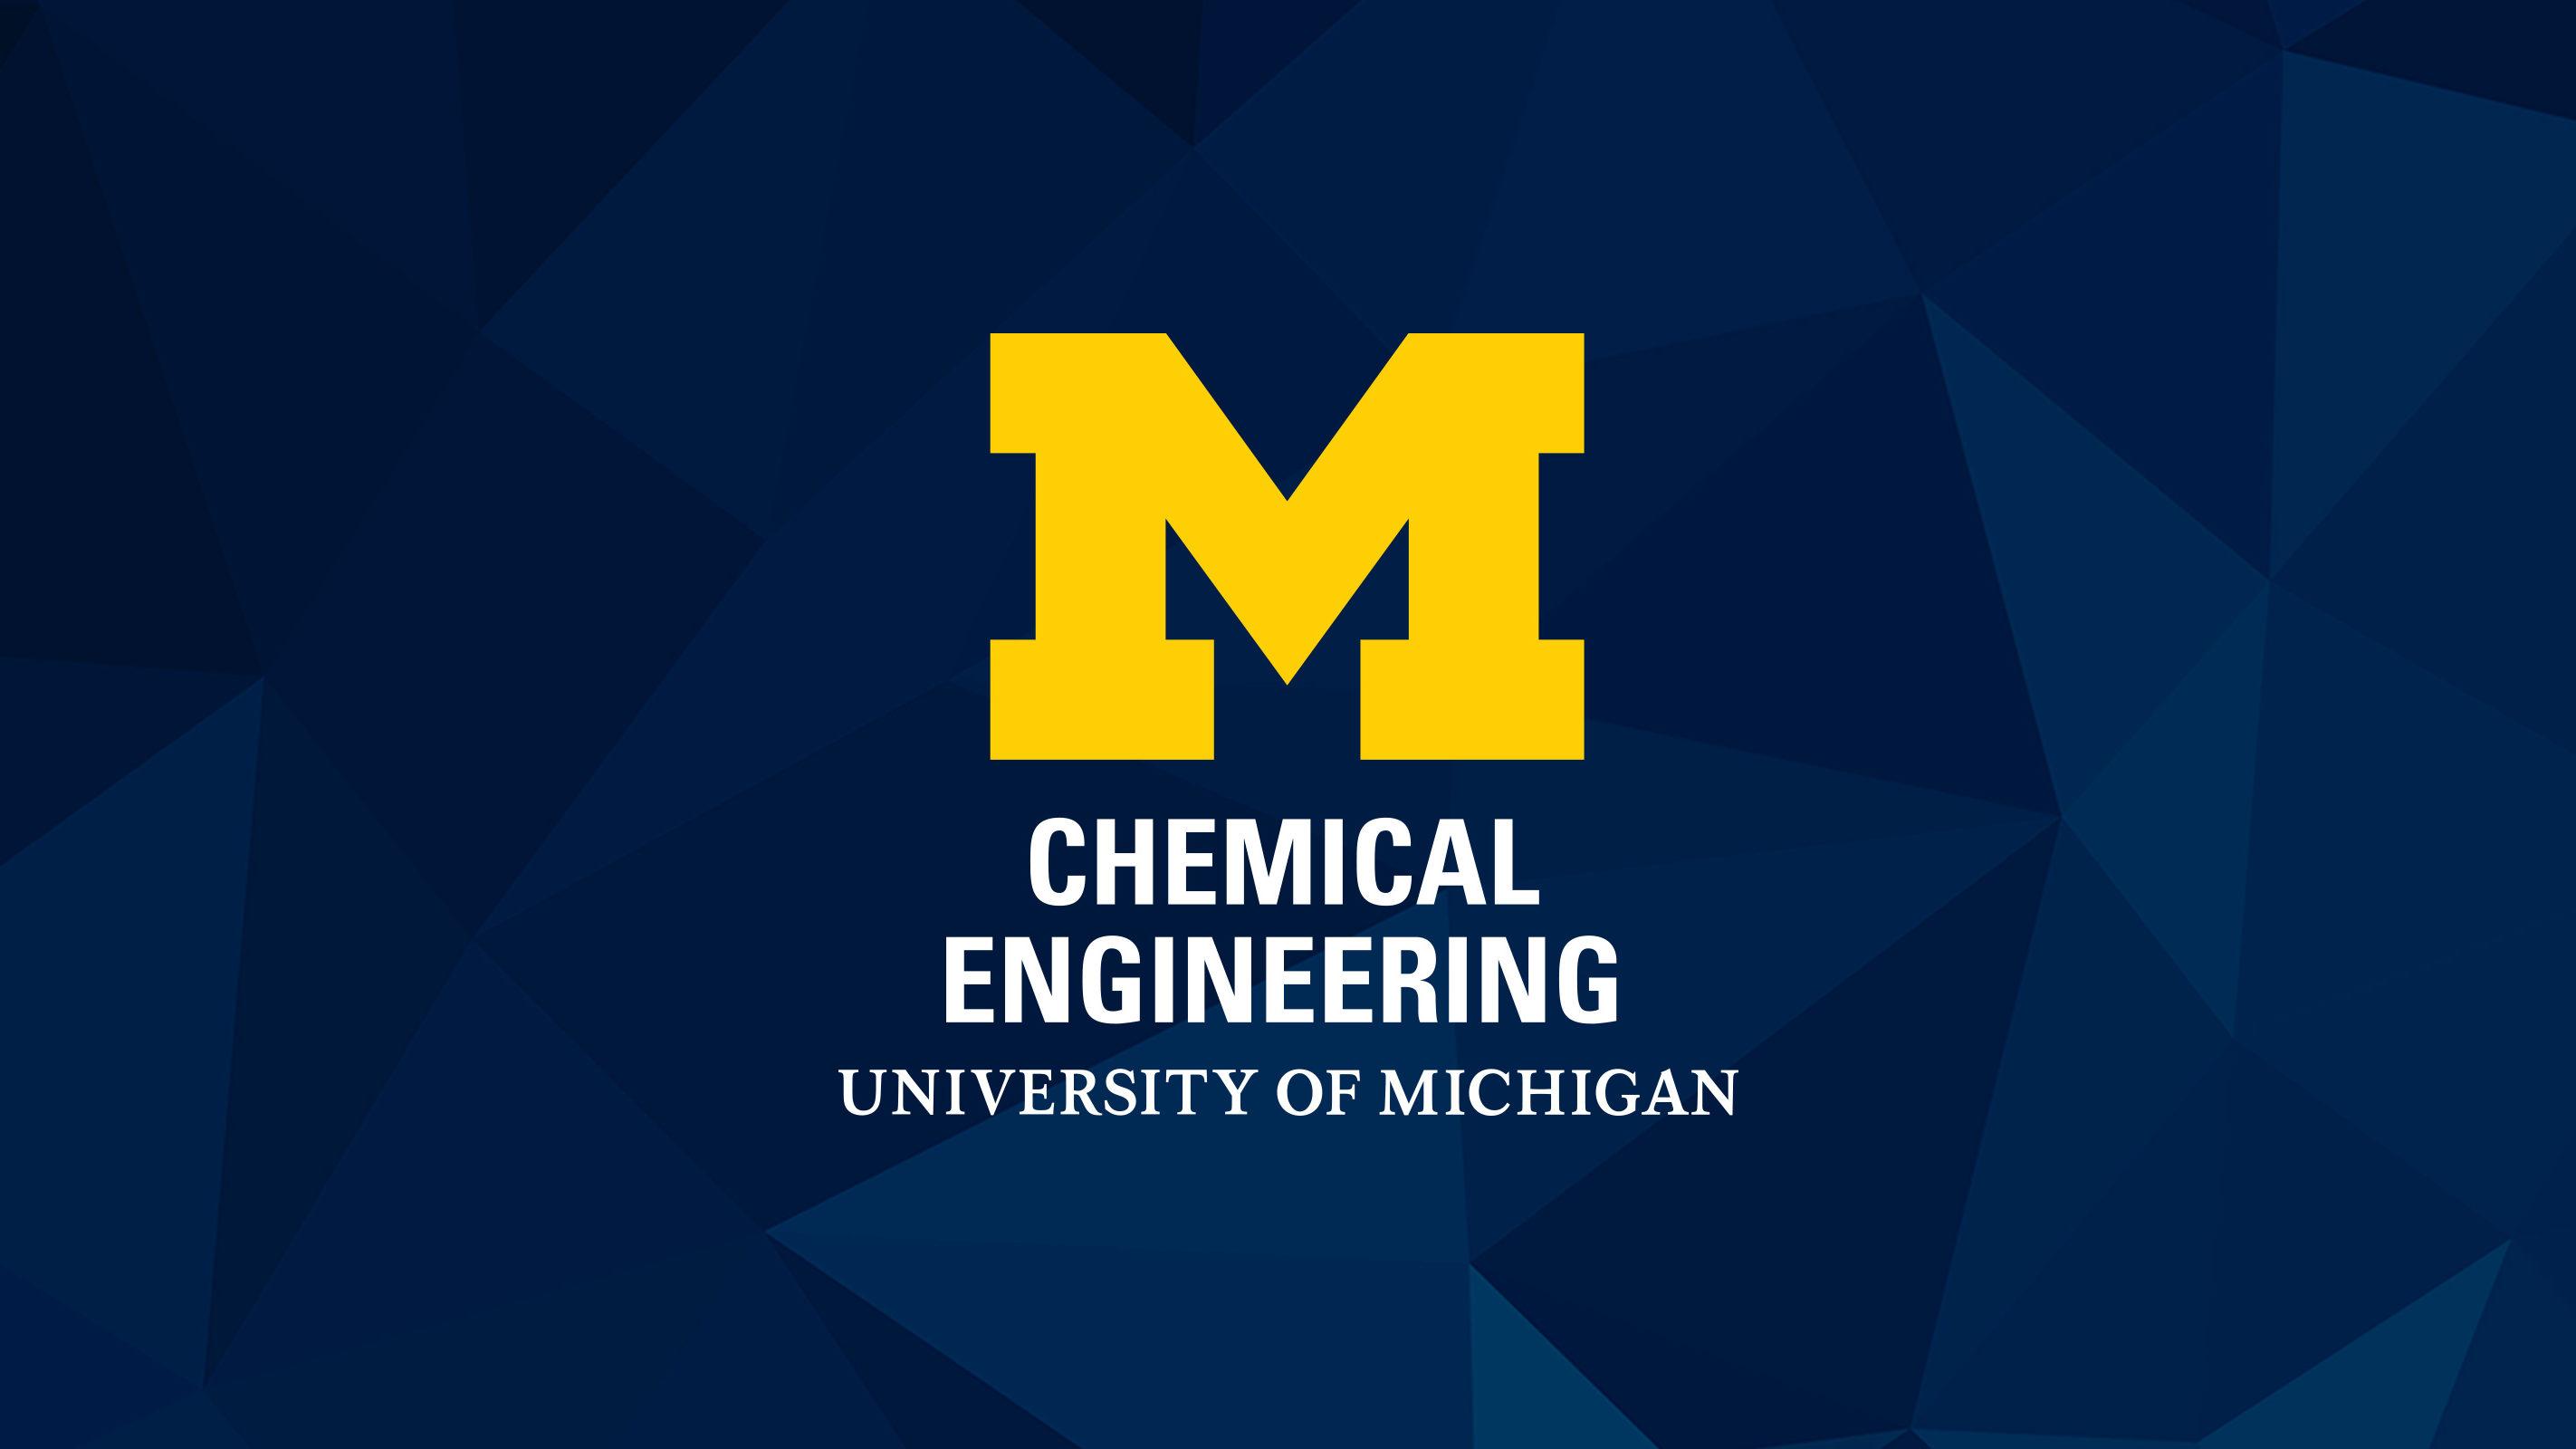 Michigan Chemical Engineering logo